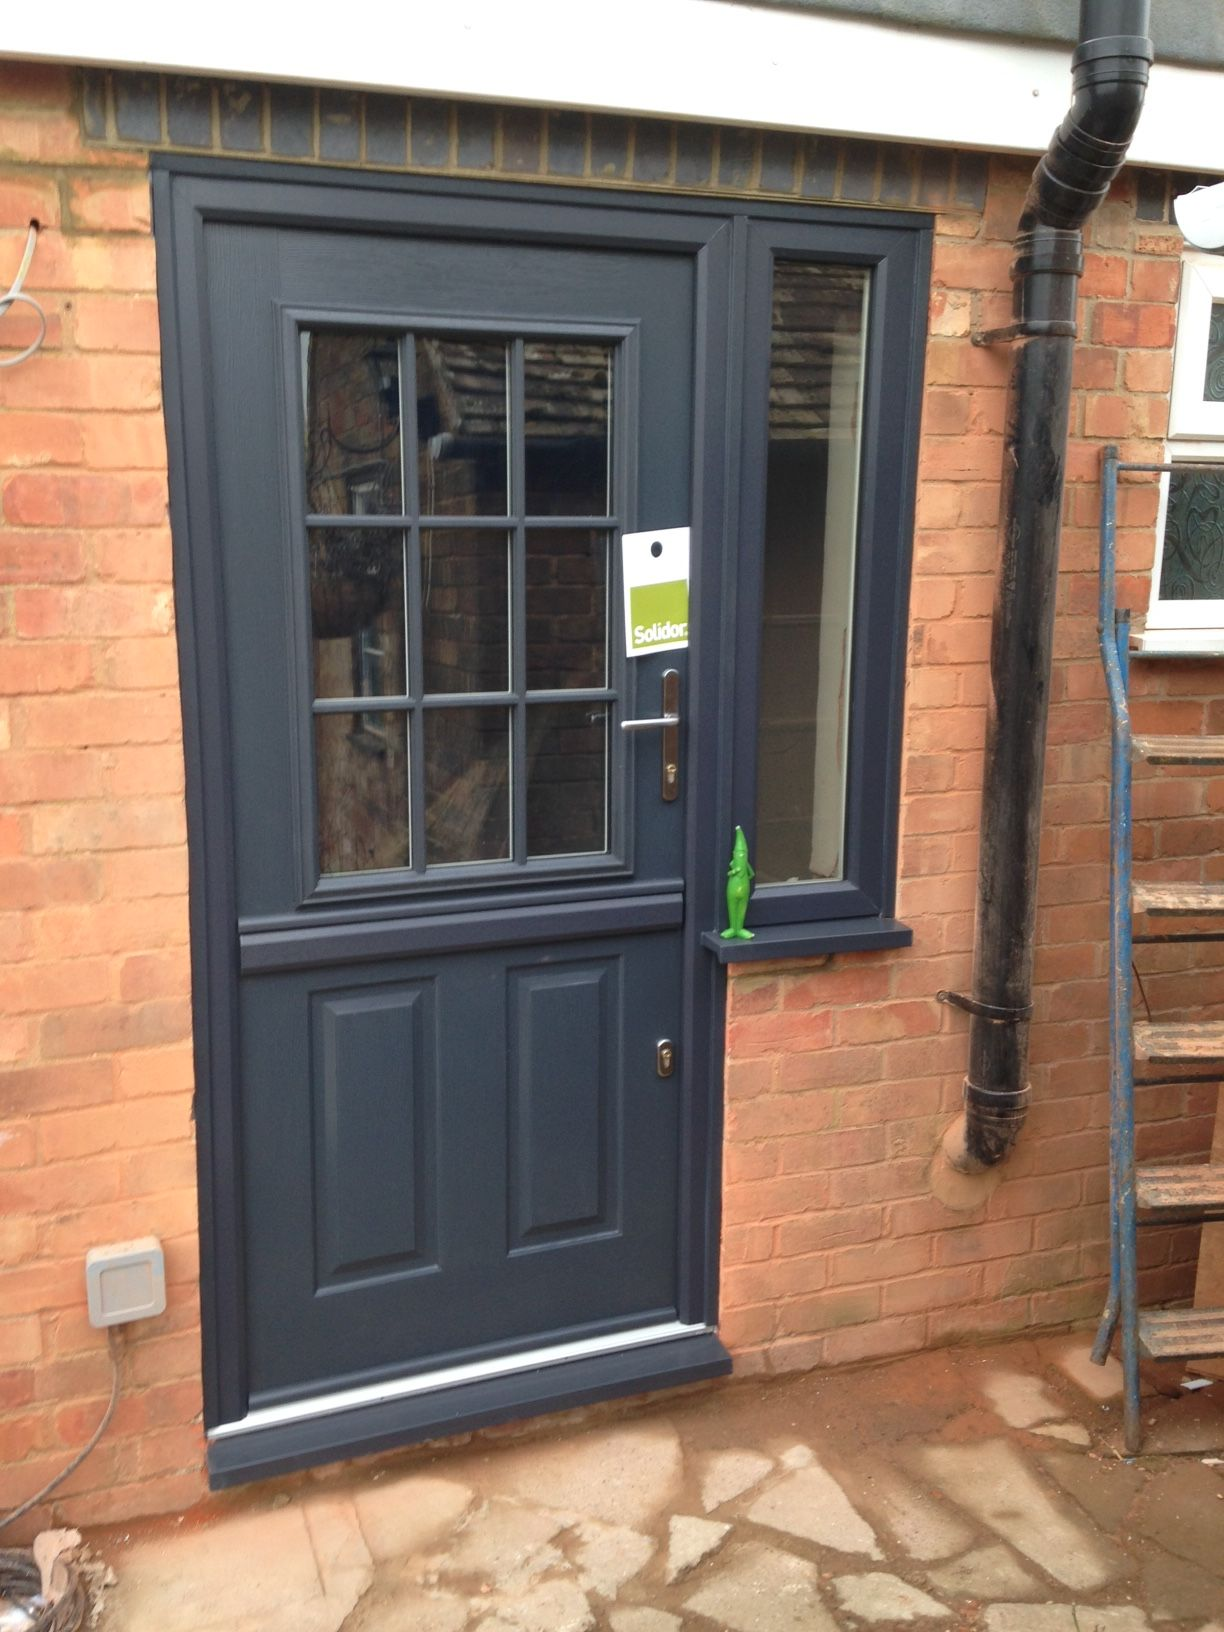 Anthracite grey Solidor Stable door with flag window